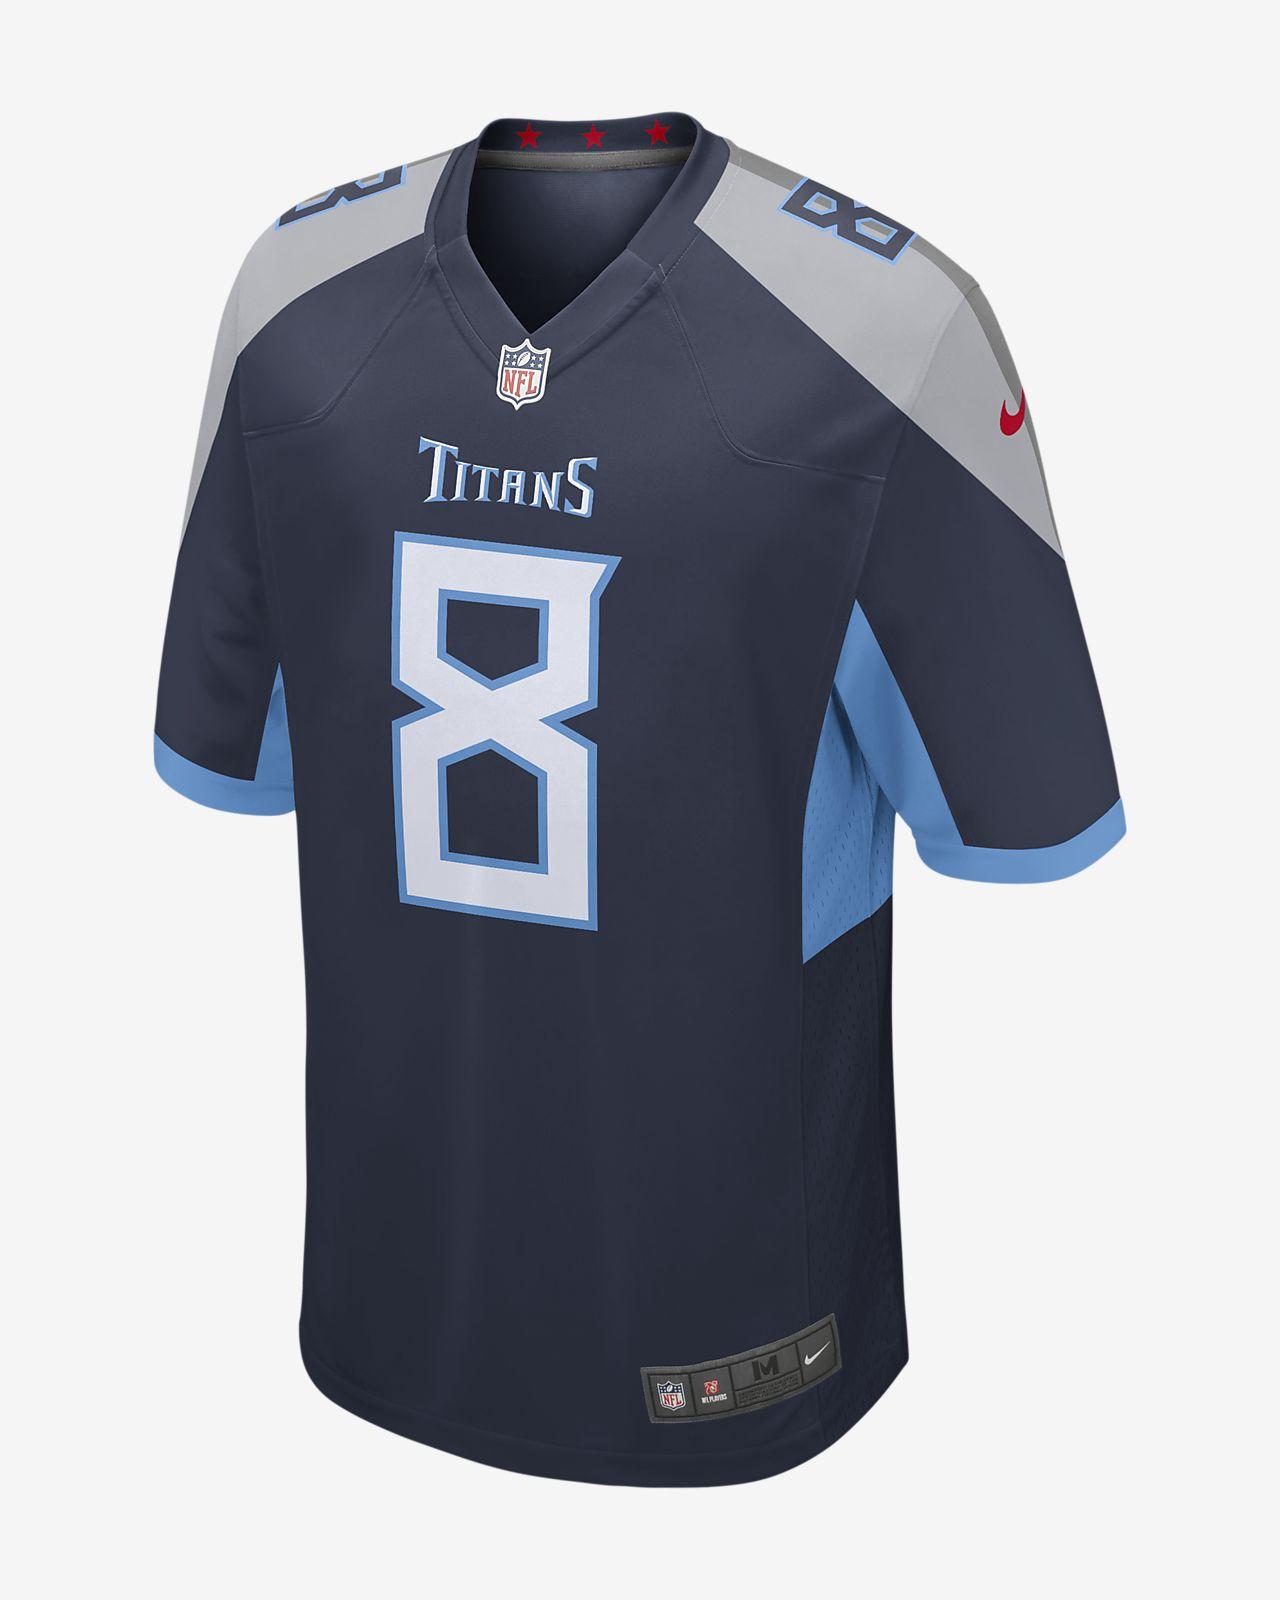 Camiseta de fútbol americano para hombre NFL Tennessee Titans Game Jersey  (Marcus Mariota) e8e2aef10c8